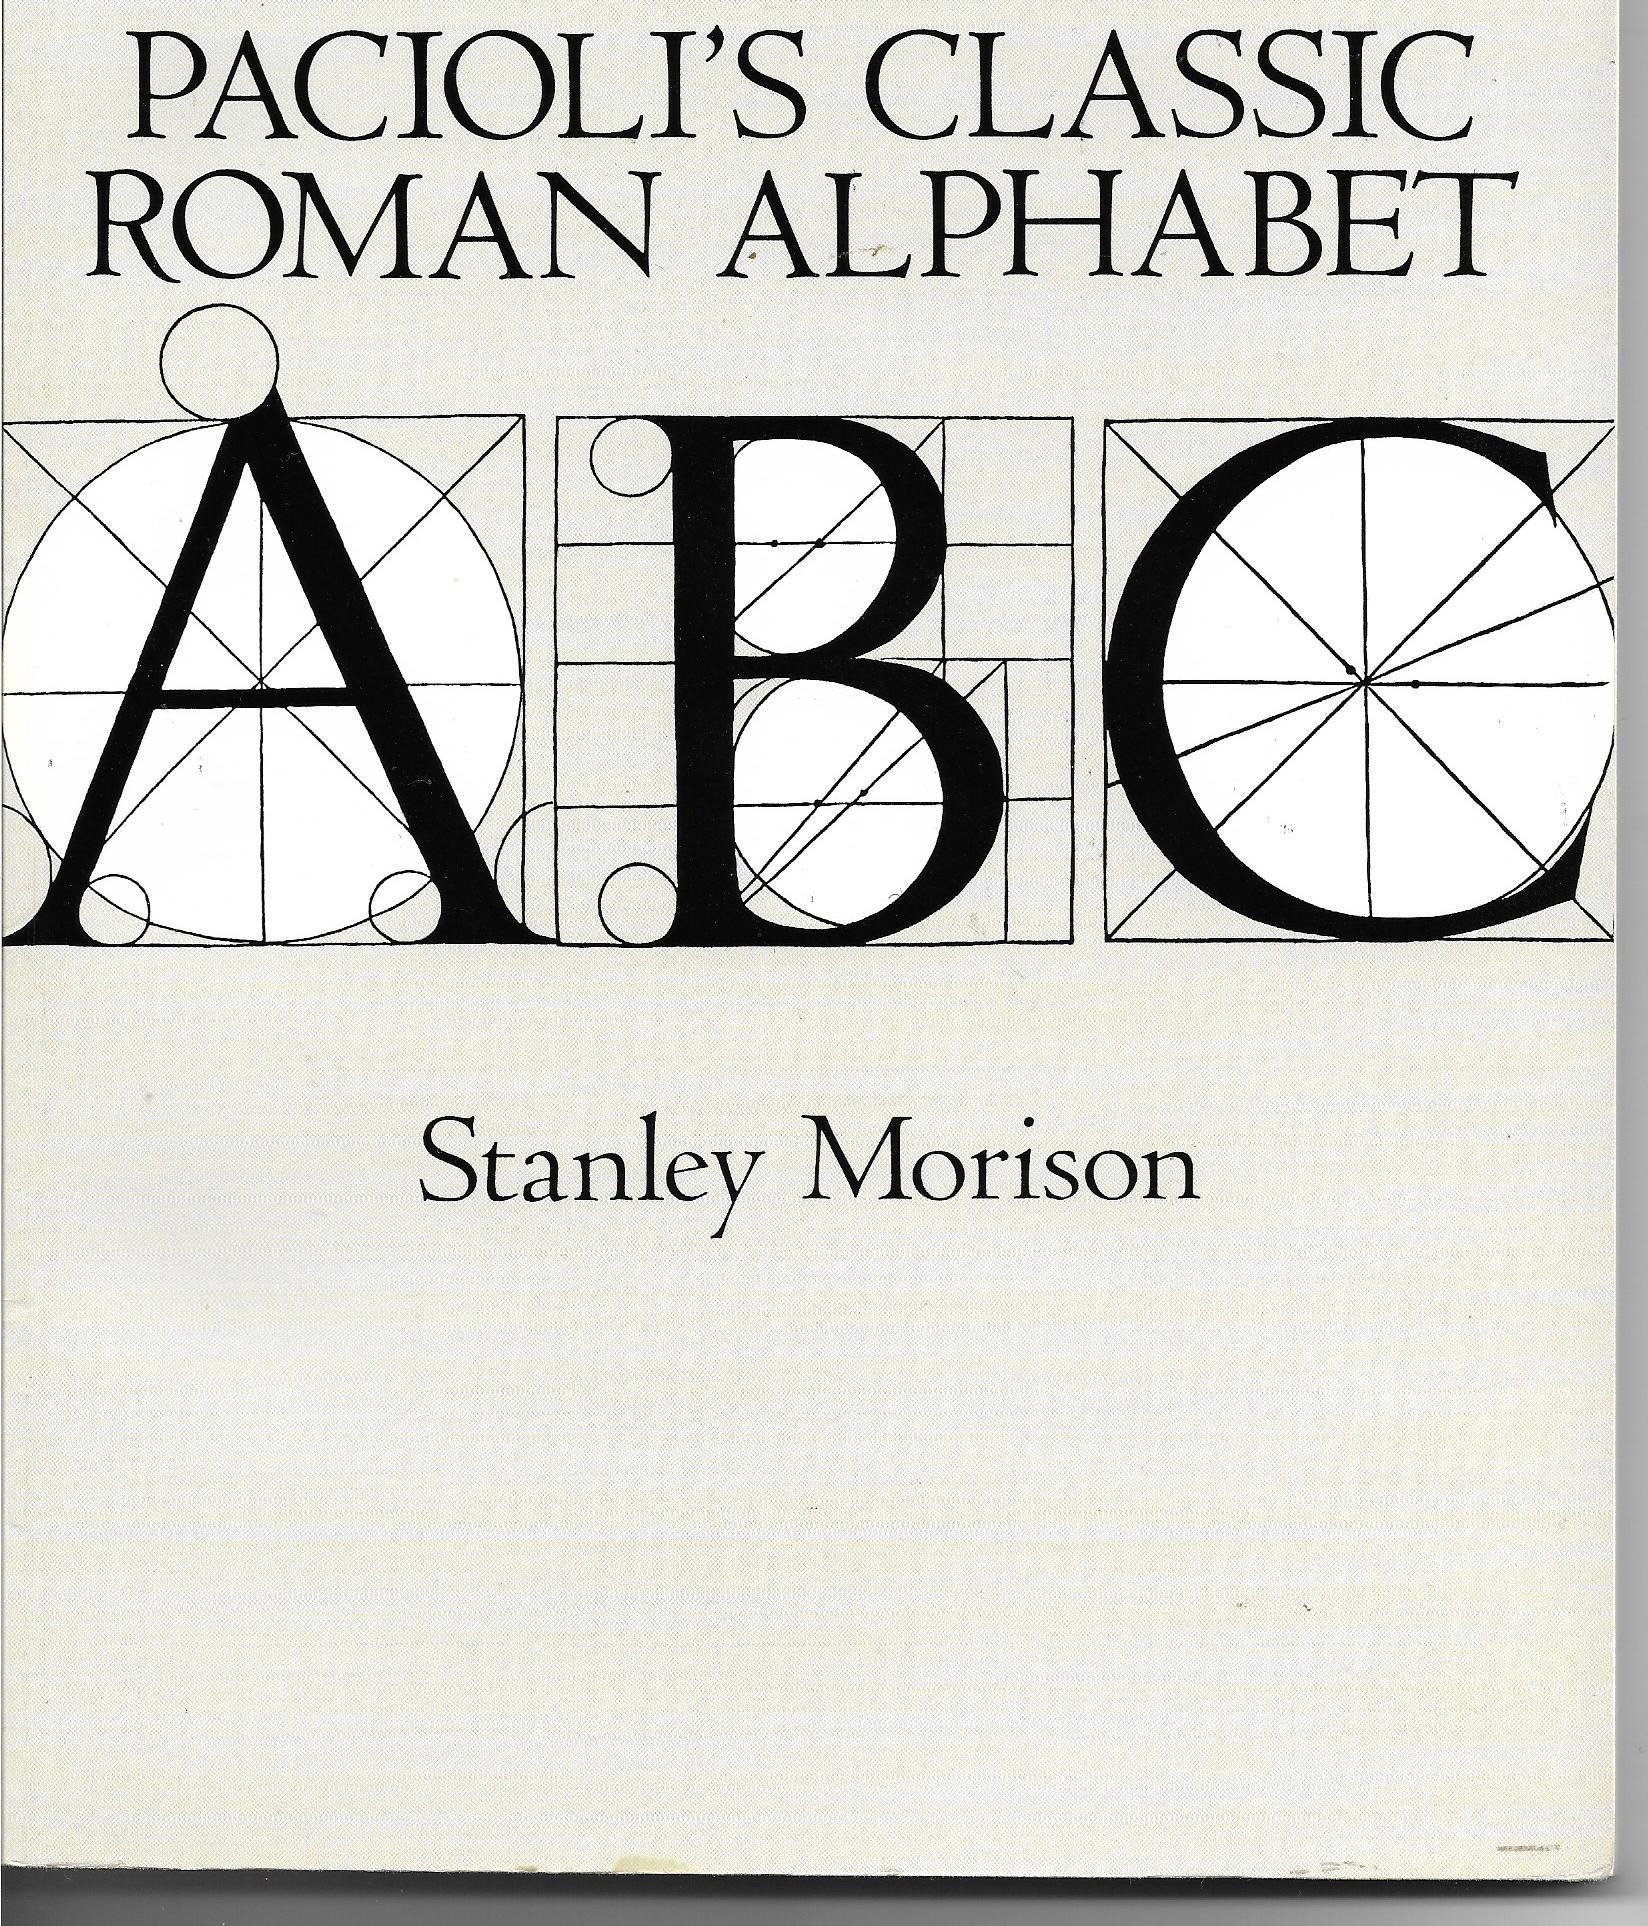 Paciolis Classic Roman Alphabet Dover Books On Lettering Graphic Arts And Printing Stanley Morison 9780486279794 Amazon